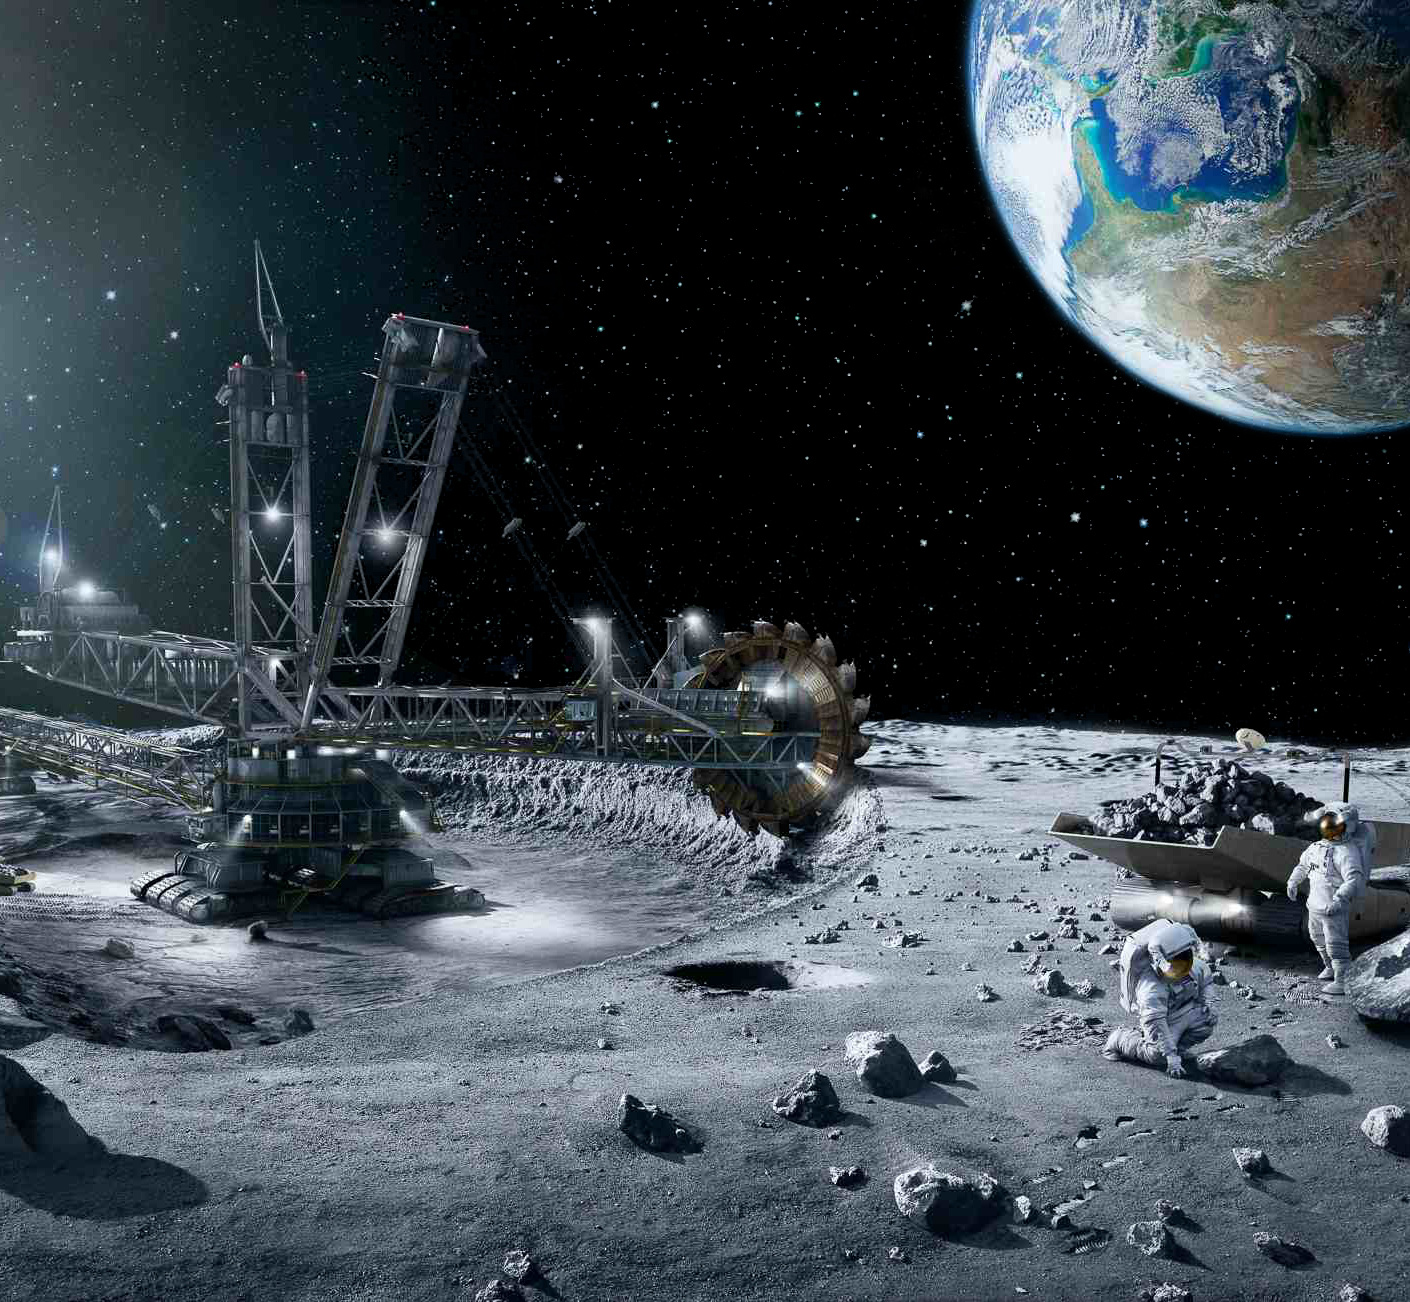 gp_asteroide-exploitation-miniere-2.jpg